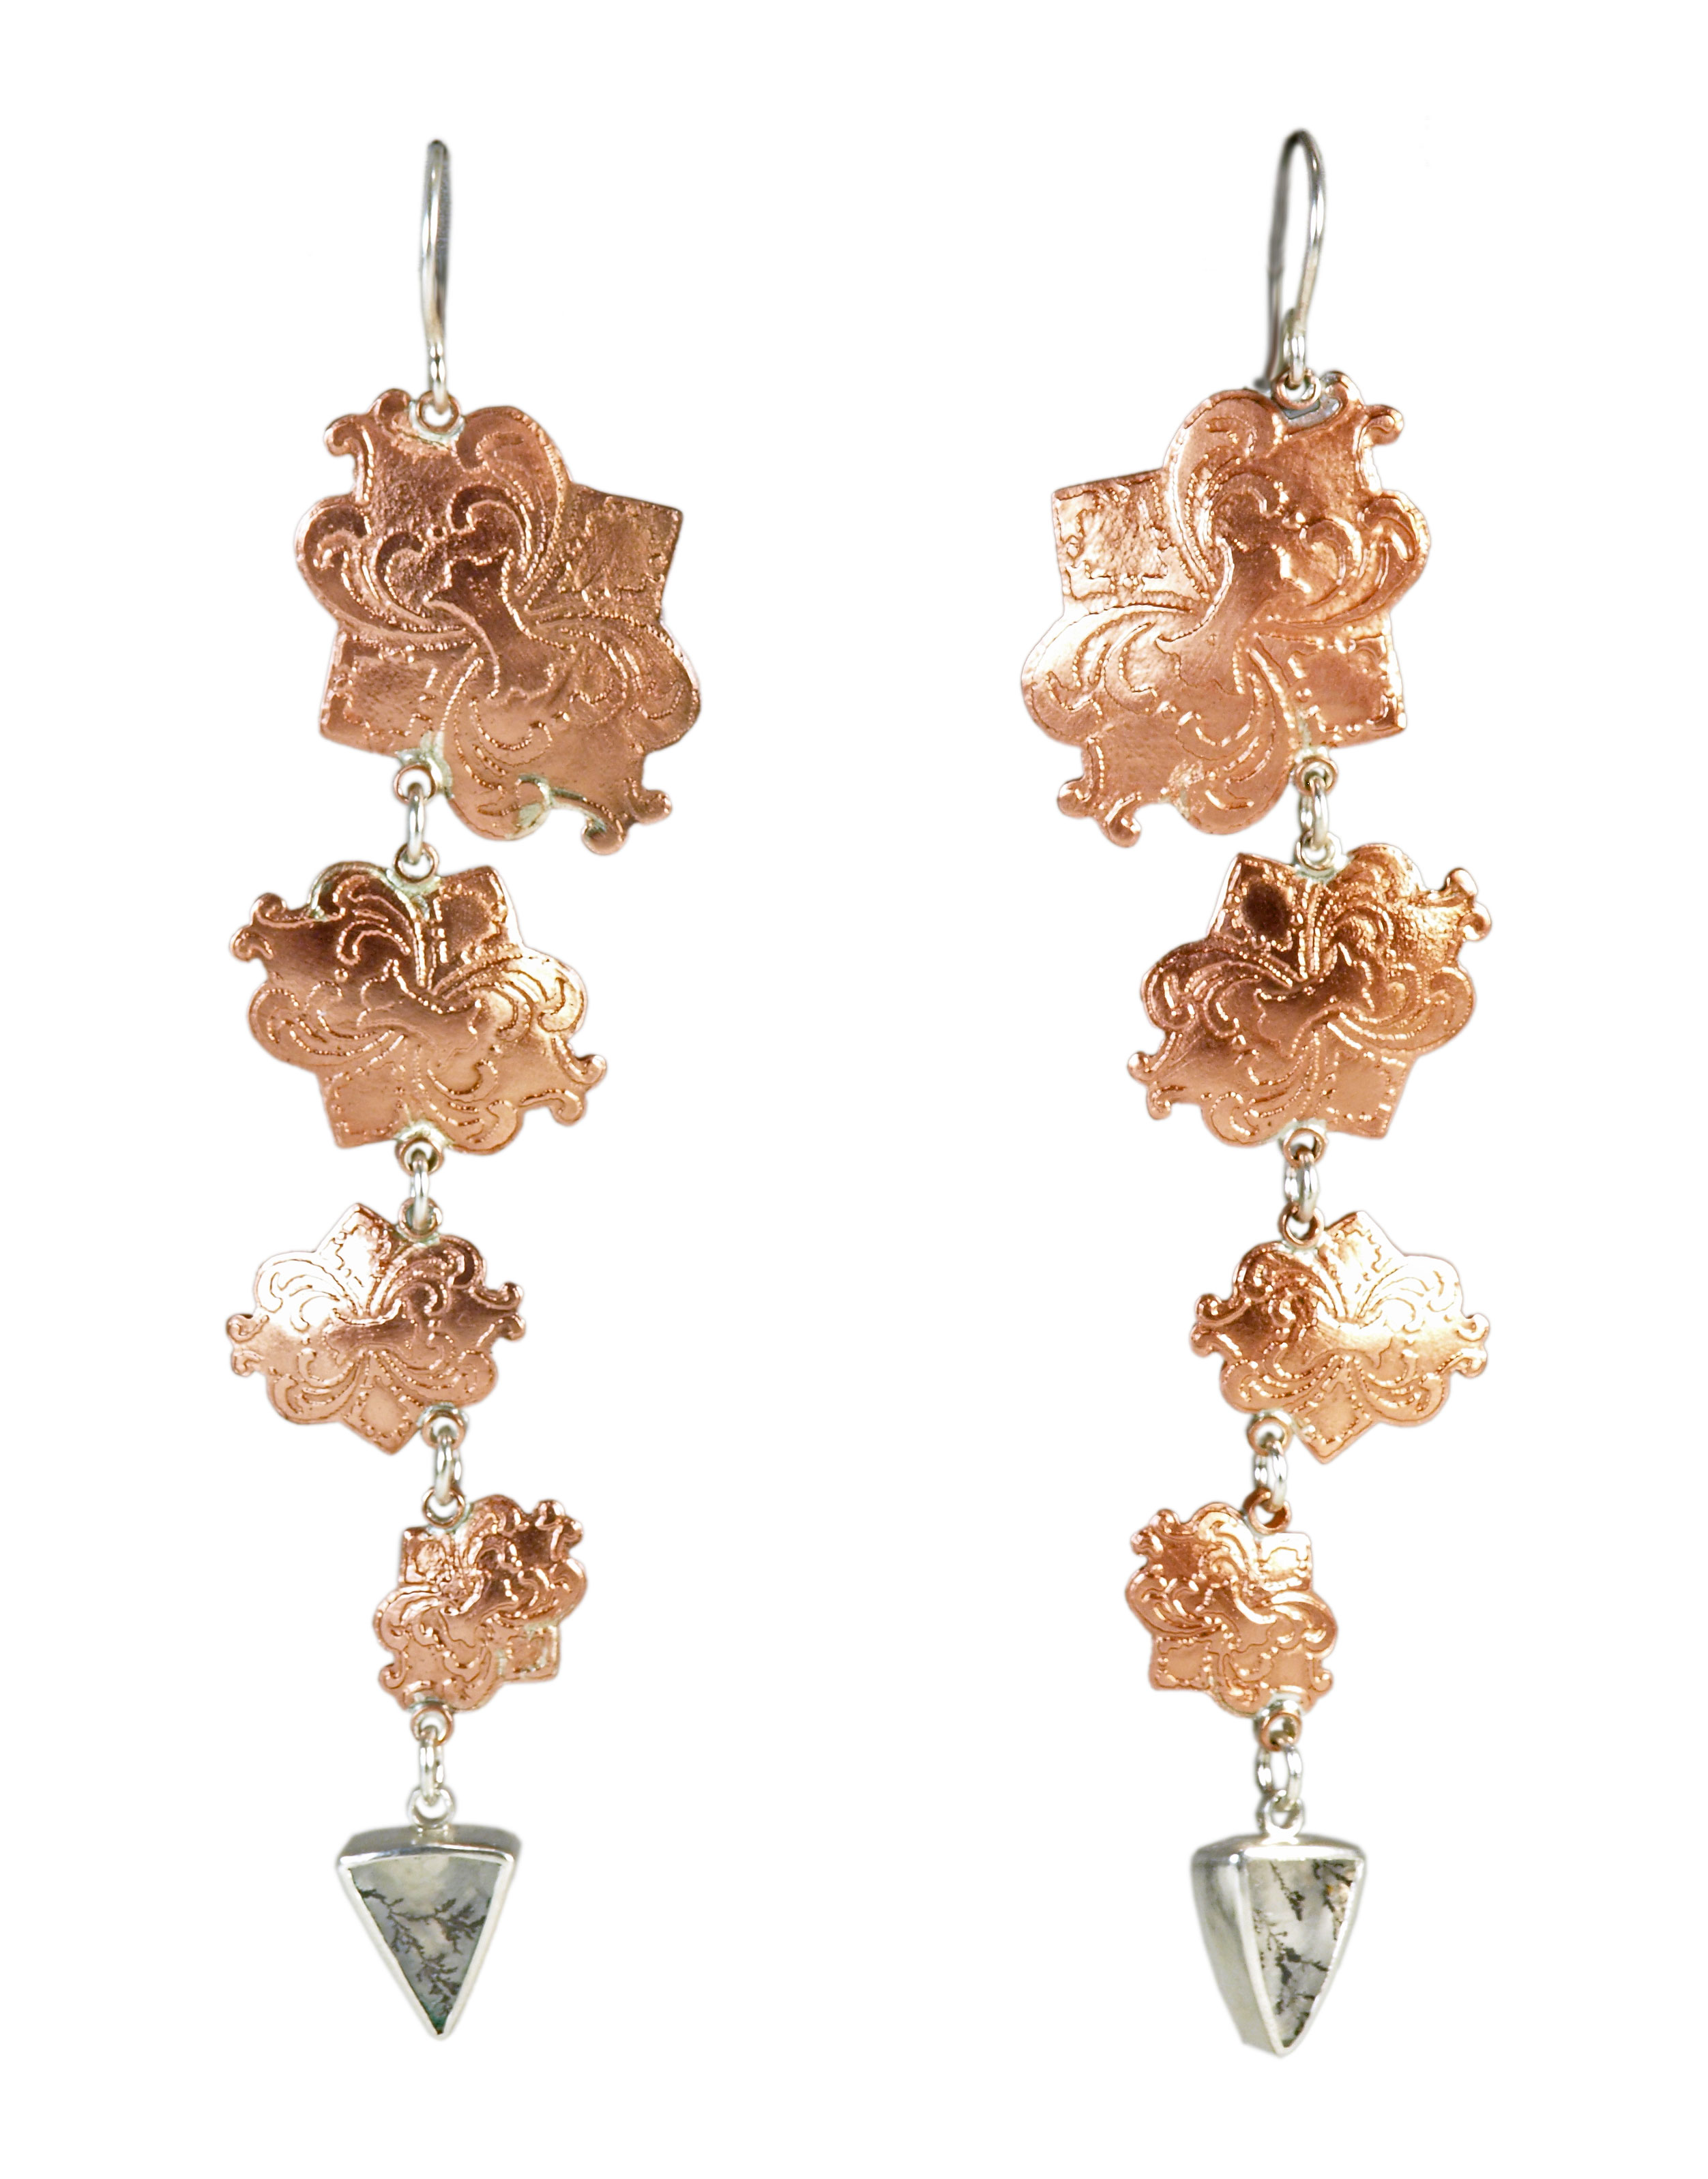 Agaidika Earrings